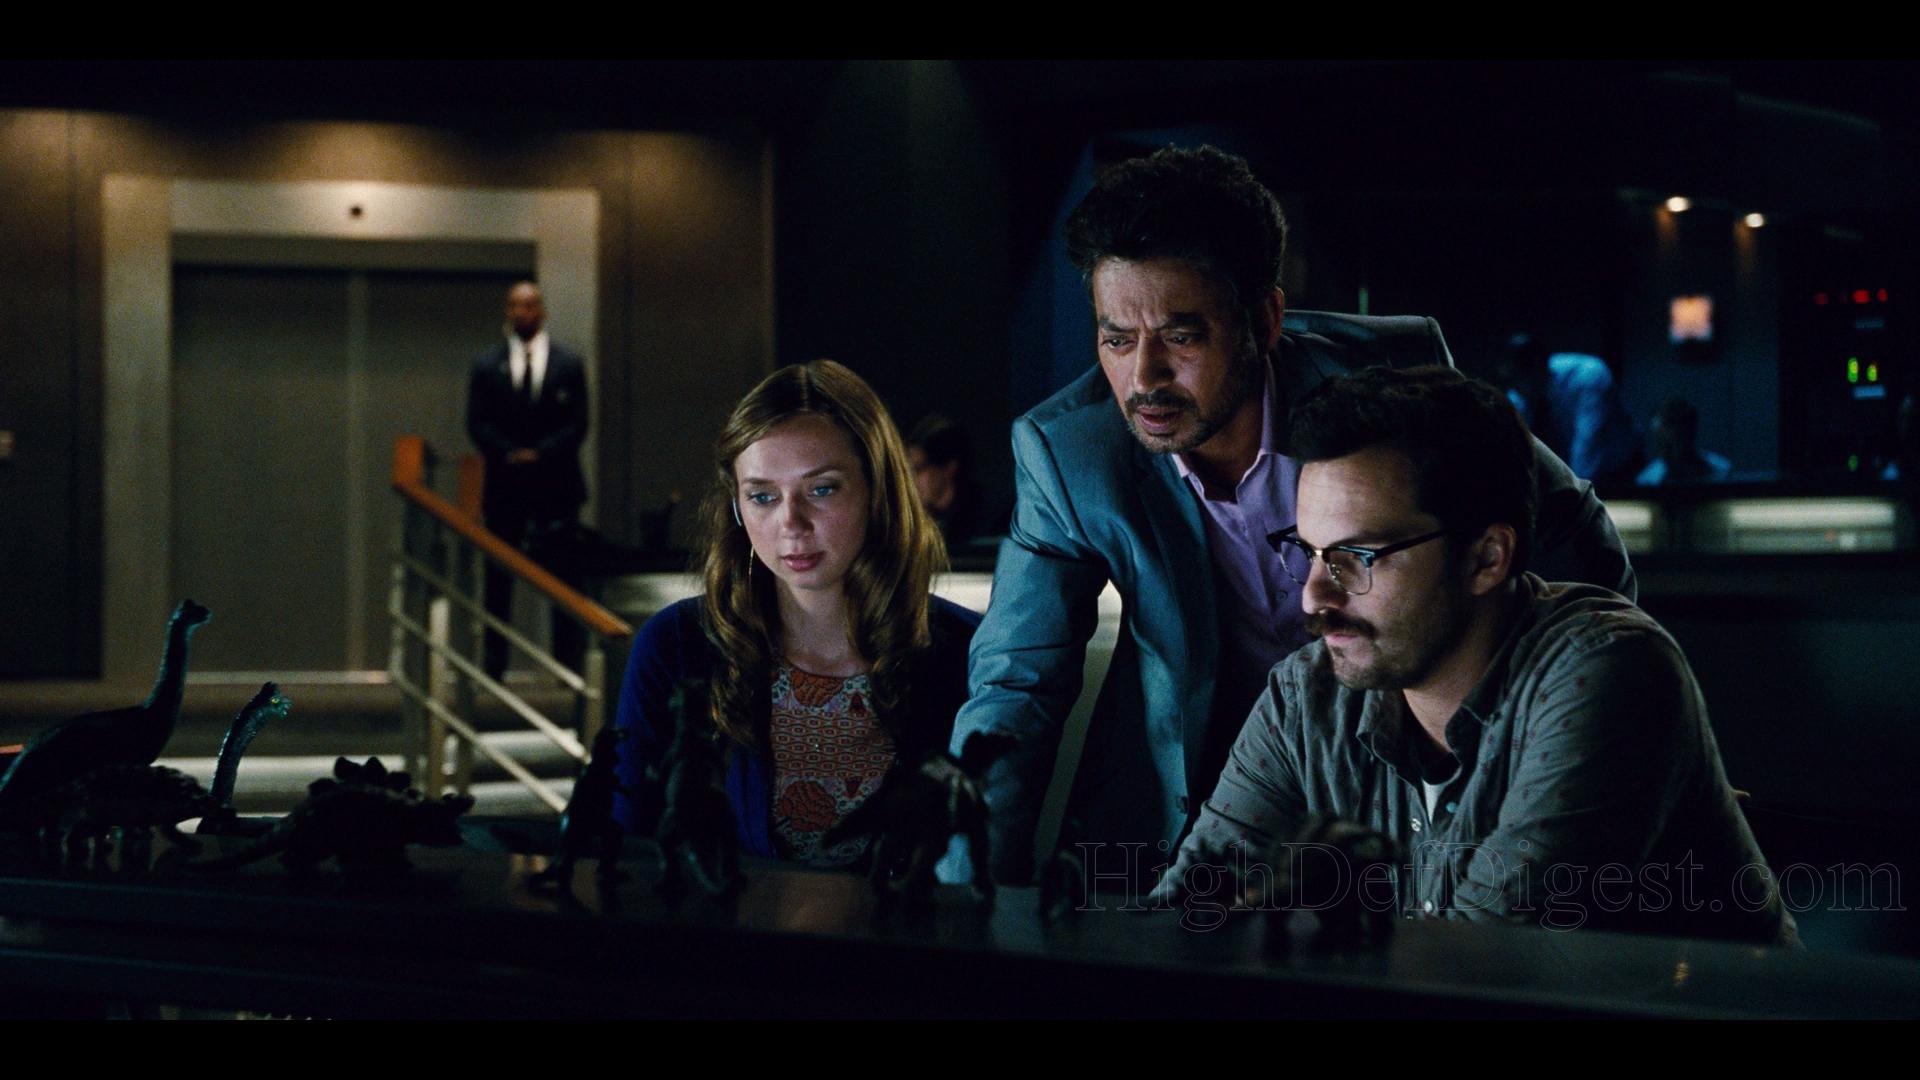 Blue Room Movie Plot